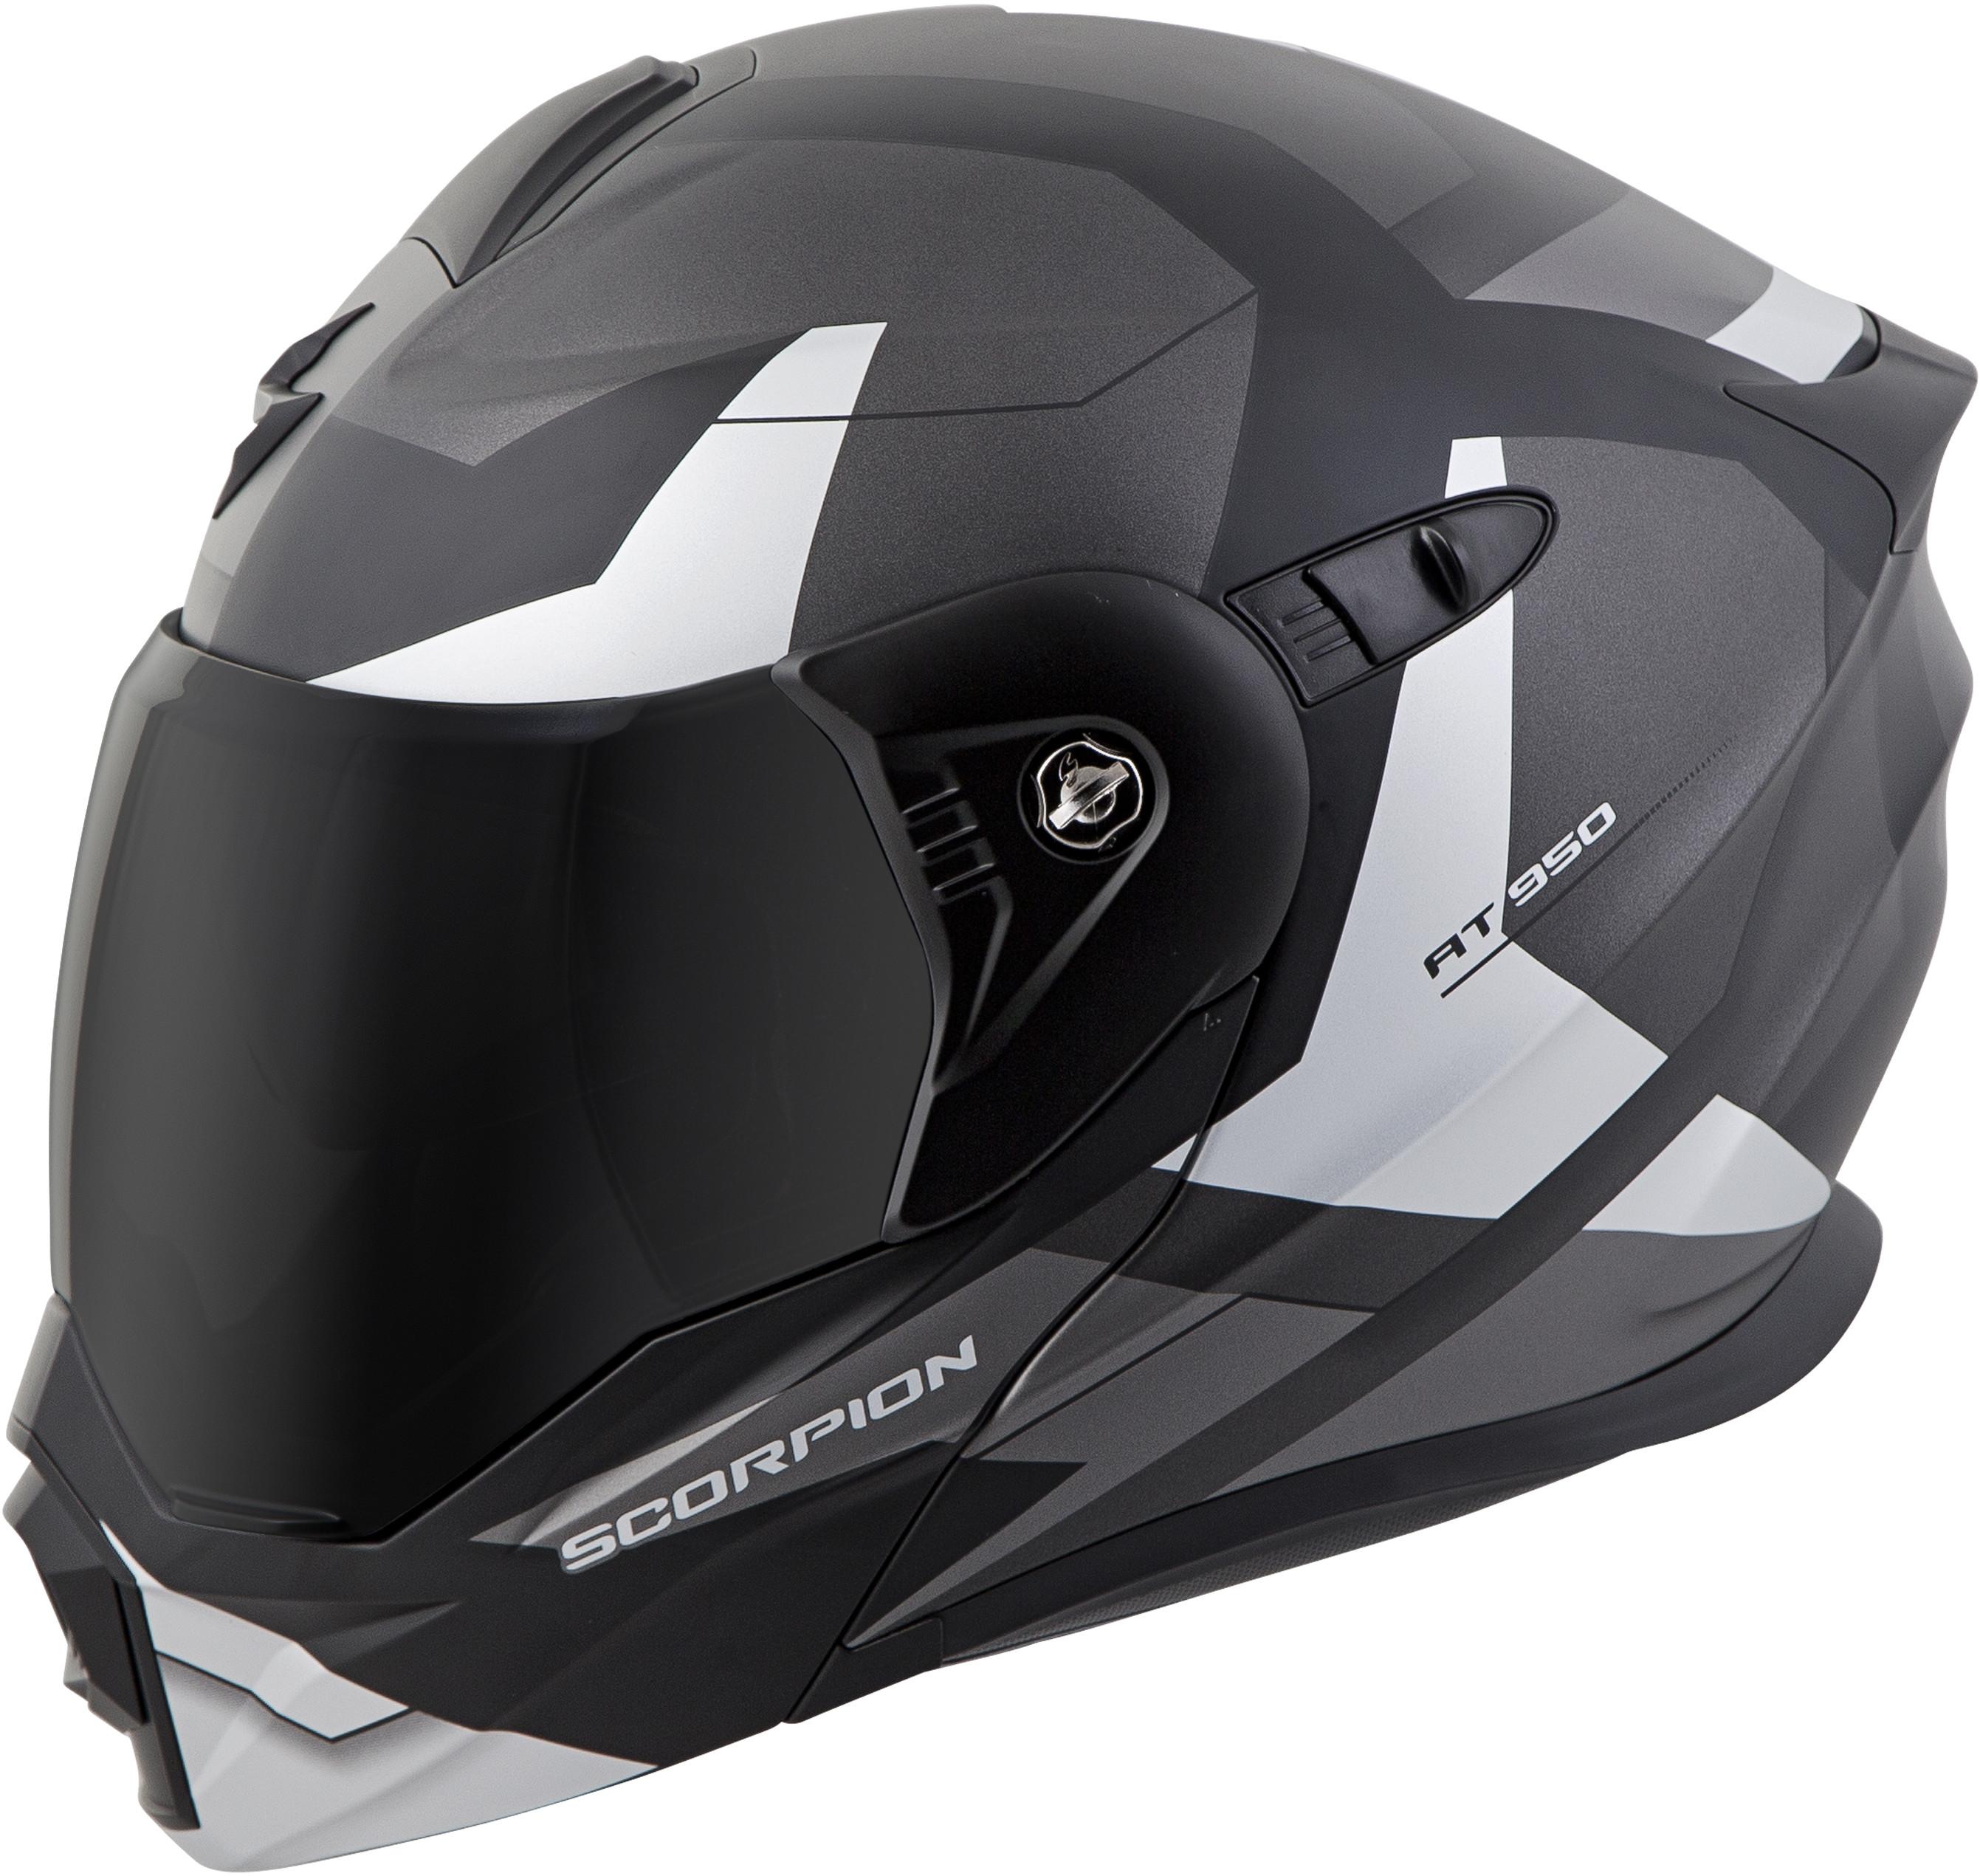 for-Scorpion-Helmet-EXO-AT950-Neocon-Snow-Helmet-with-Dual-Lens-Shield miniature 33